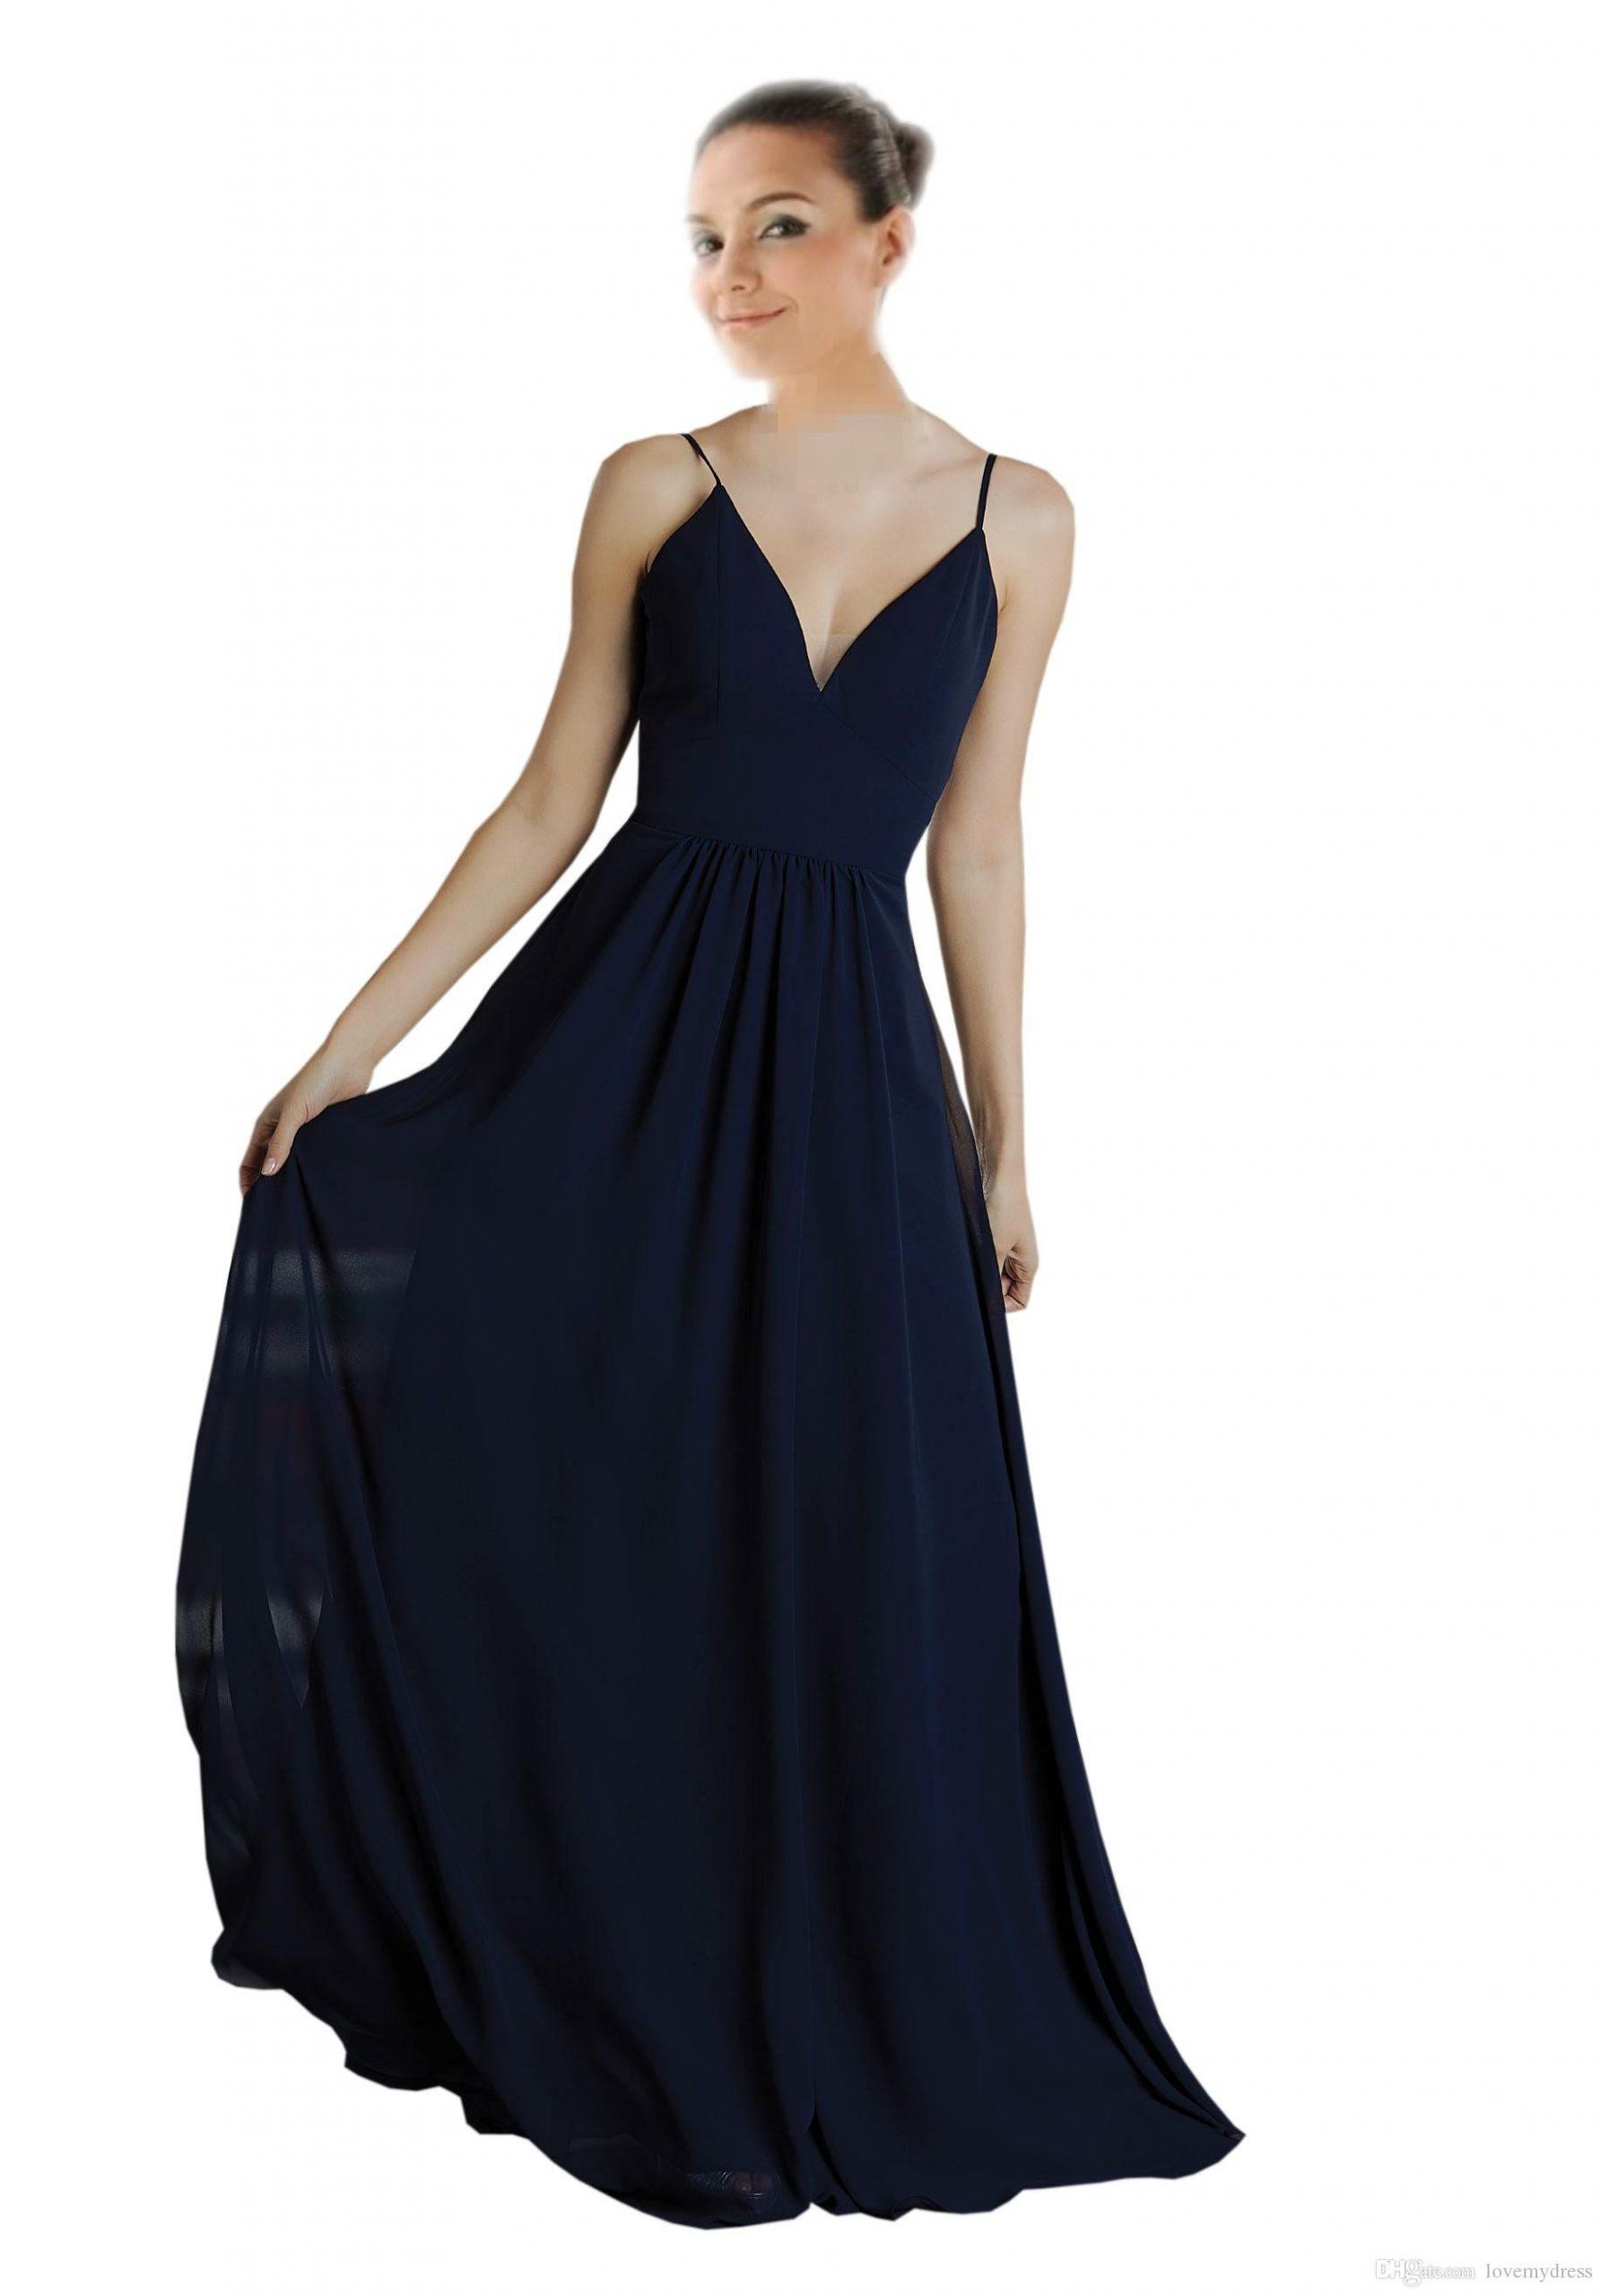 15 Perfekt Billige Kleider VertriebFormal Genial Billige Kleider Bester Preis